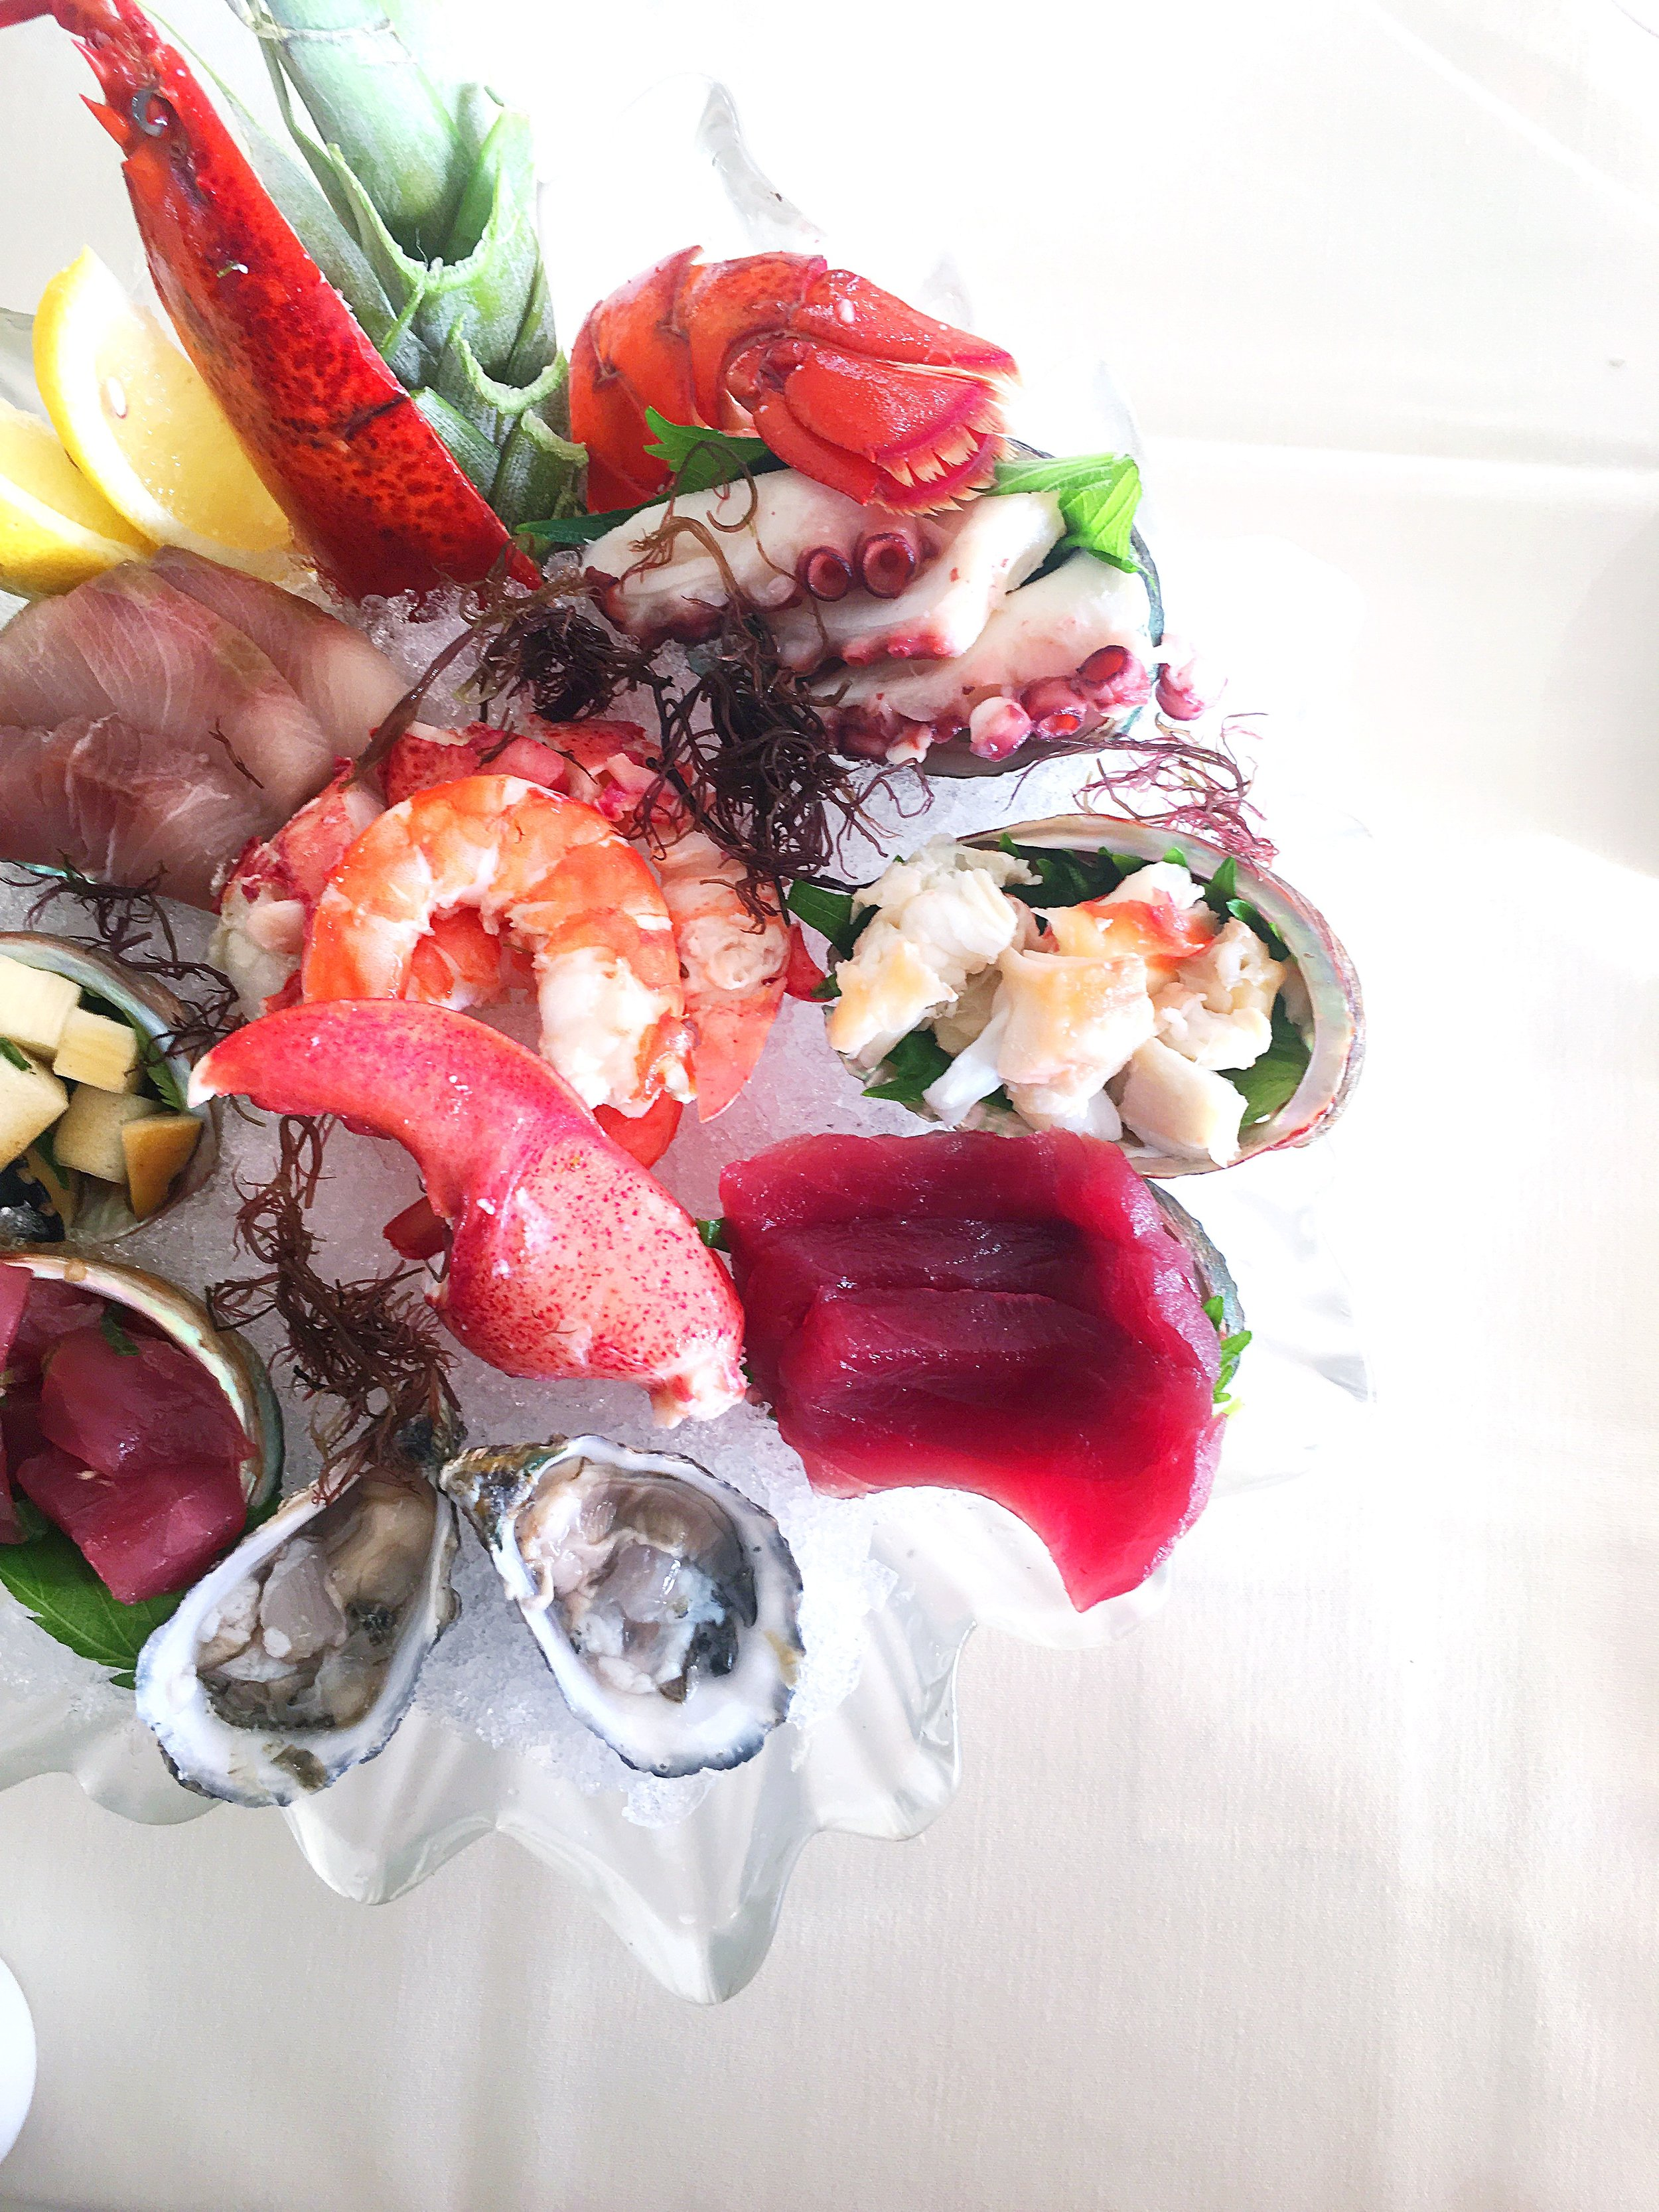 Michel's seafood platter